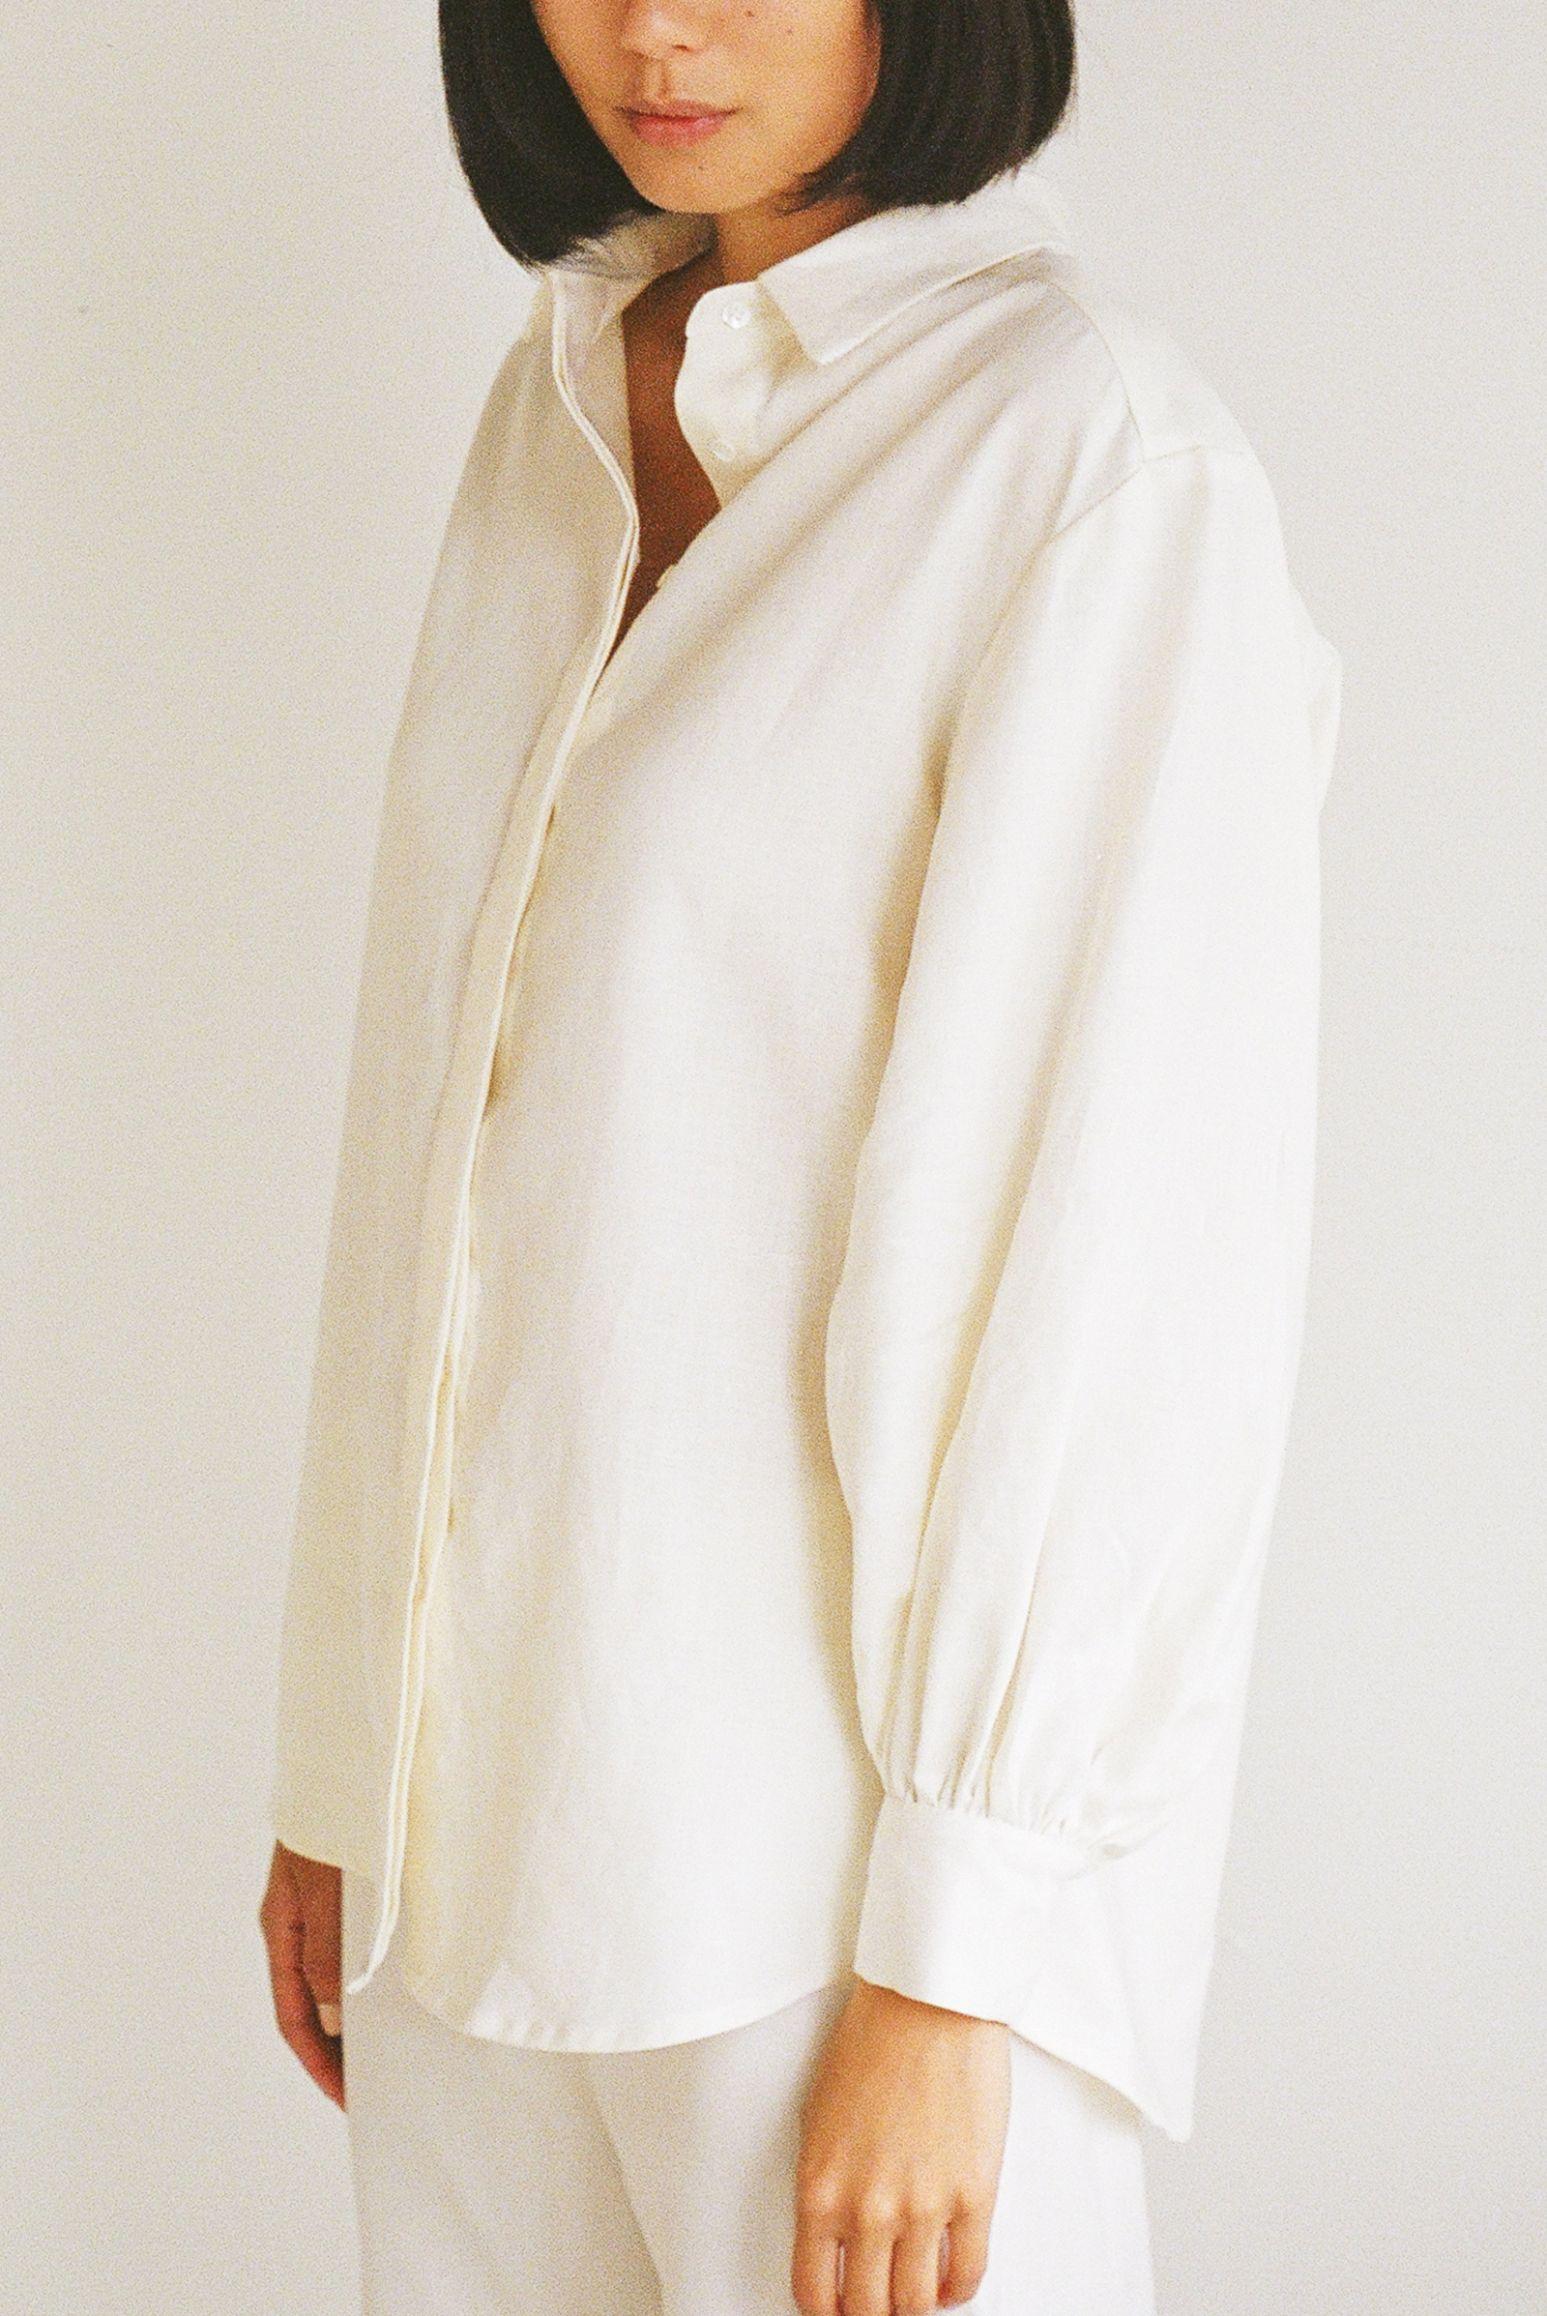 Mes shirt Ivory - Ellis Label - Linen - New Zealand clothing_0029_83090017